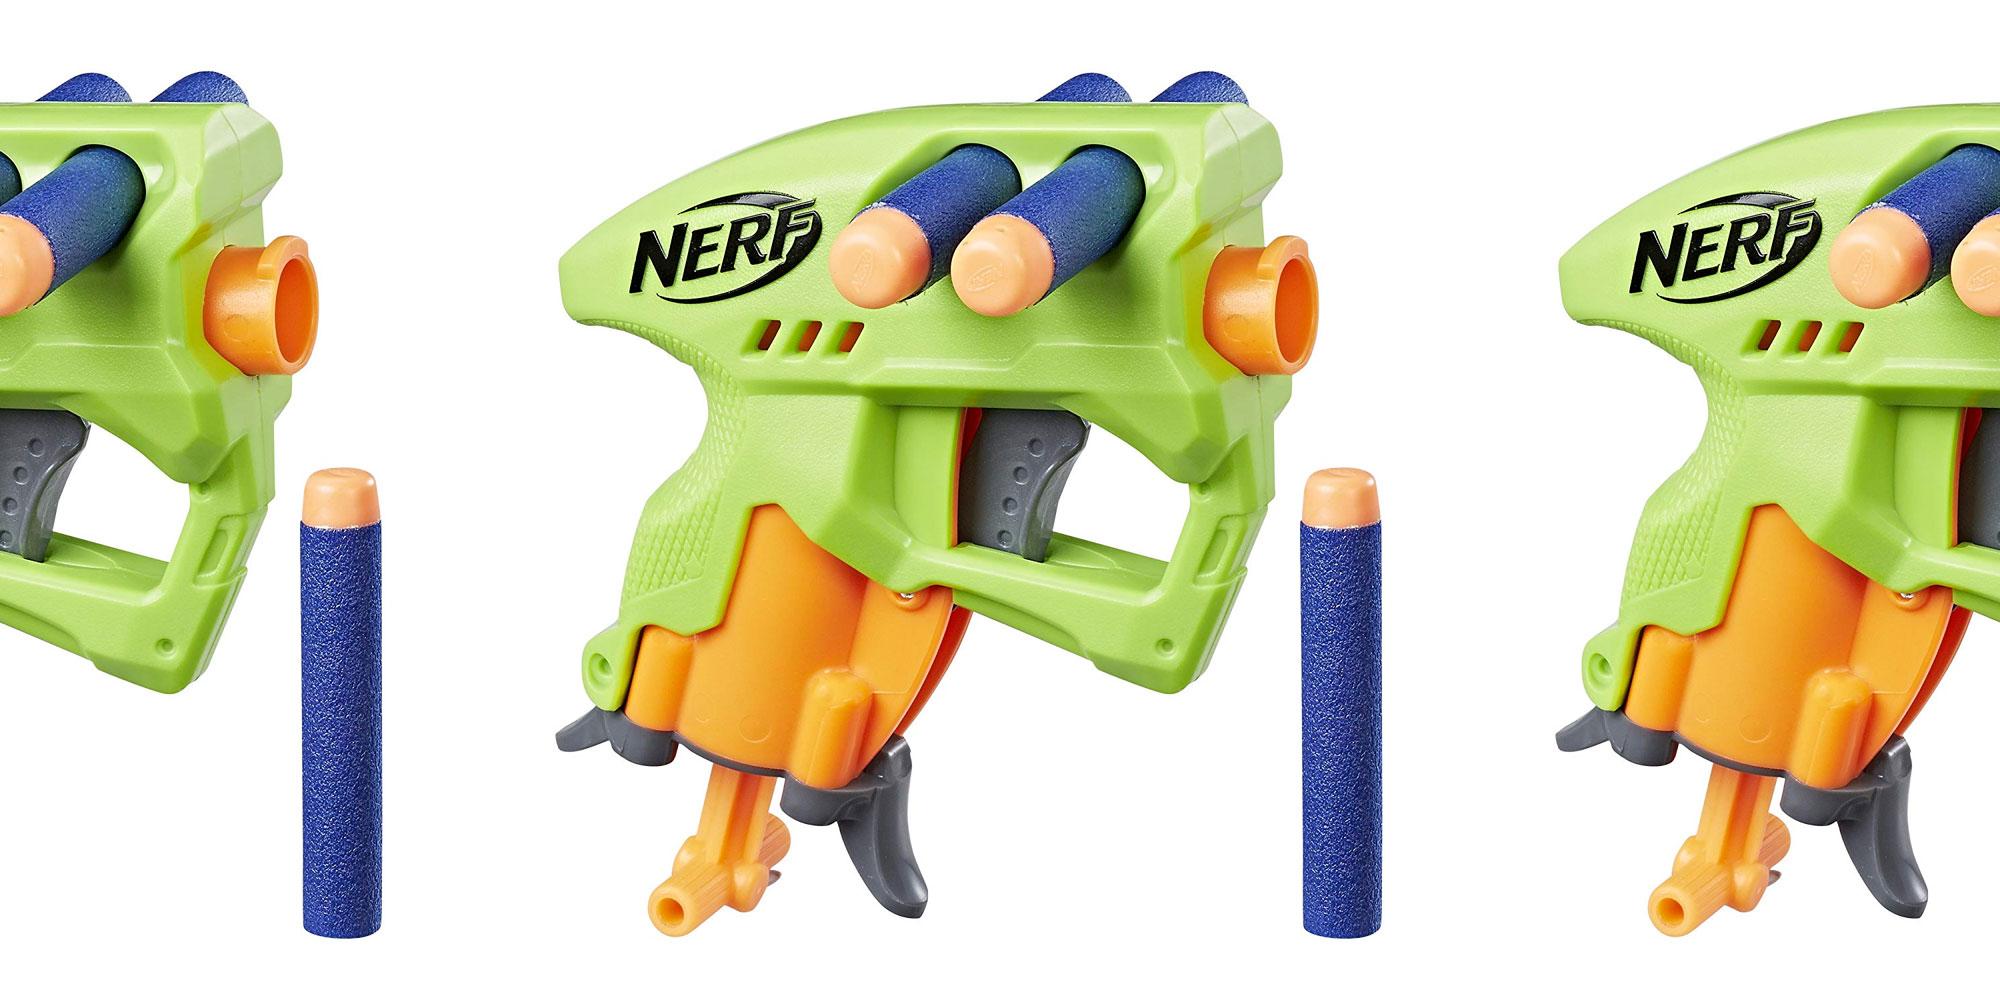 Always have a backup blaster w/ Nerf's micro N-Strike NanoFire Dart Gun for $2.50